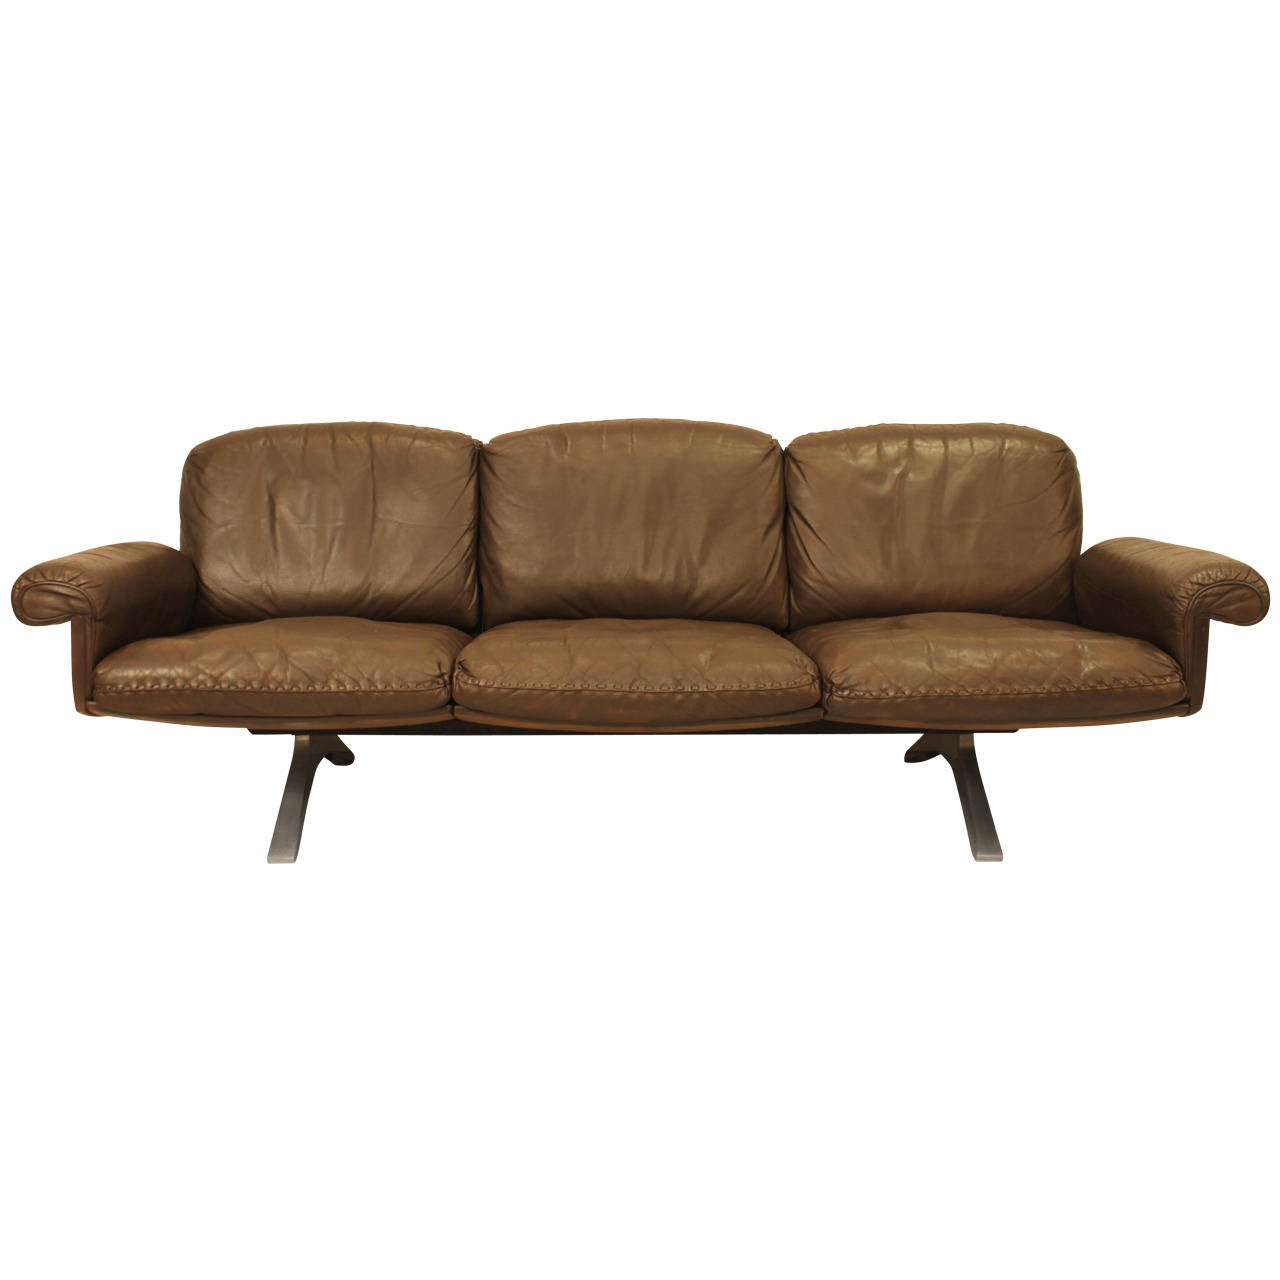 corey chocolate brown sectional sofa indoor outdoor sofabord de sede at 1stdibs